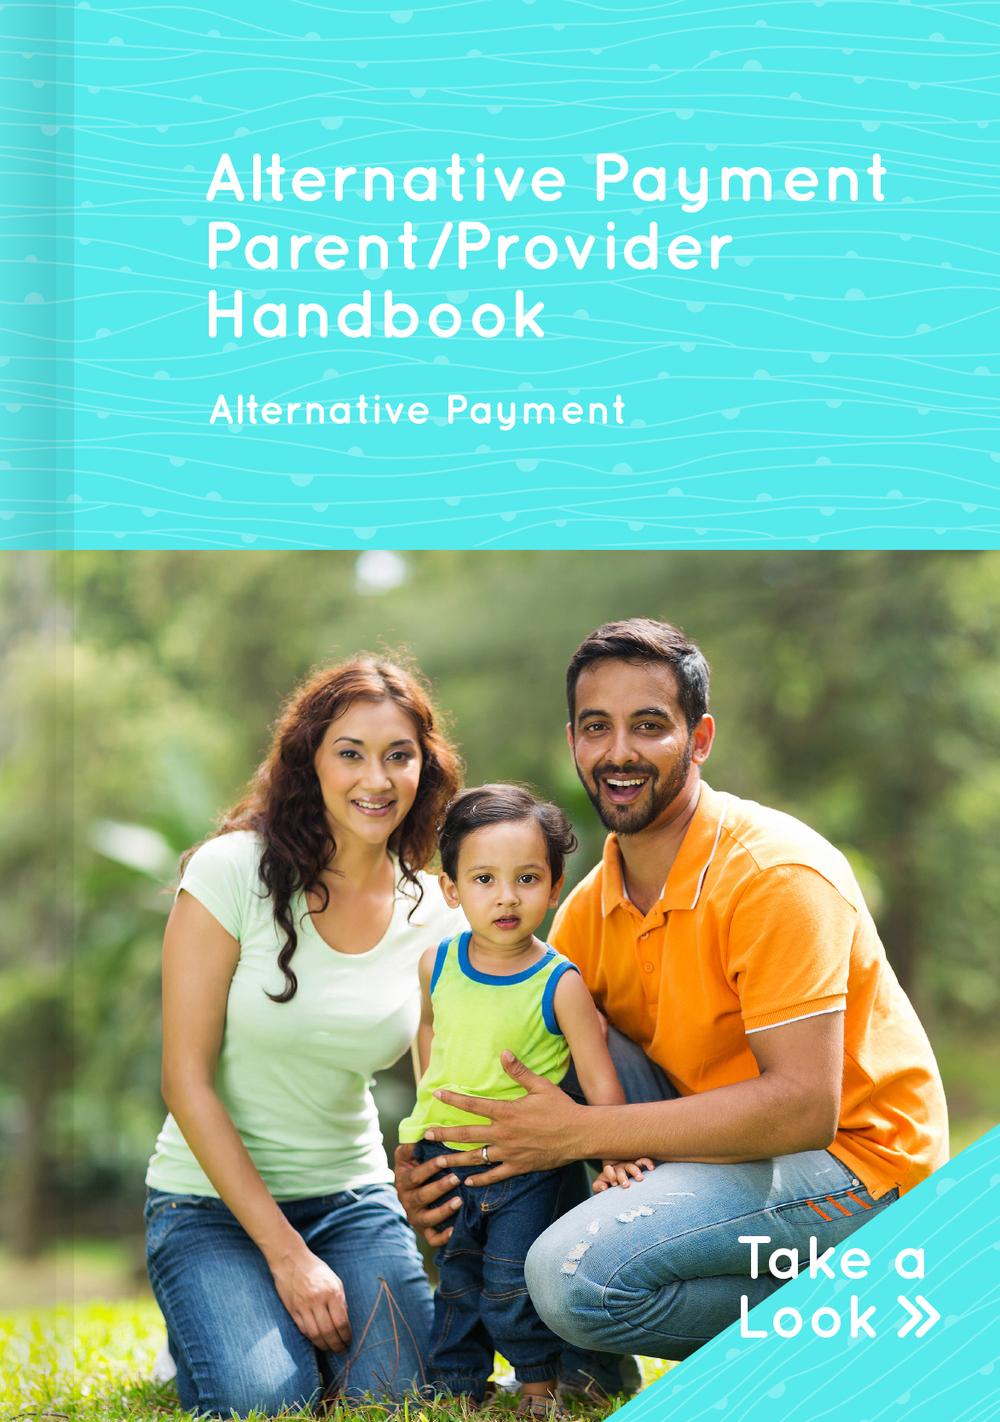 Alternative Payment Parent Provider Handbook.jpg